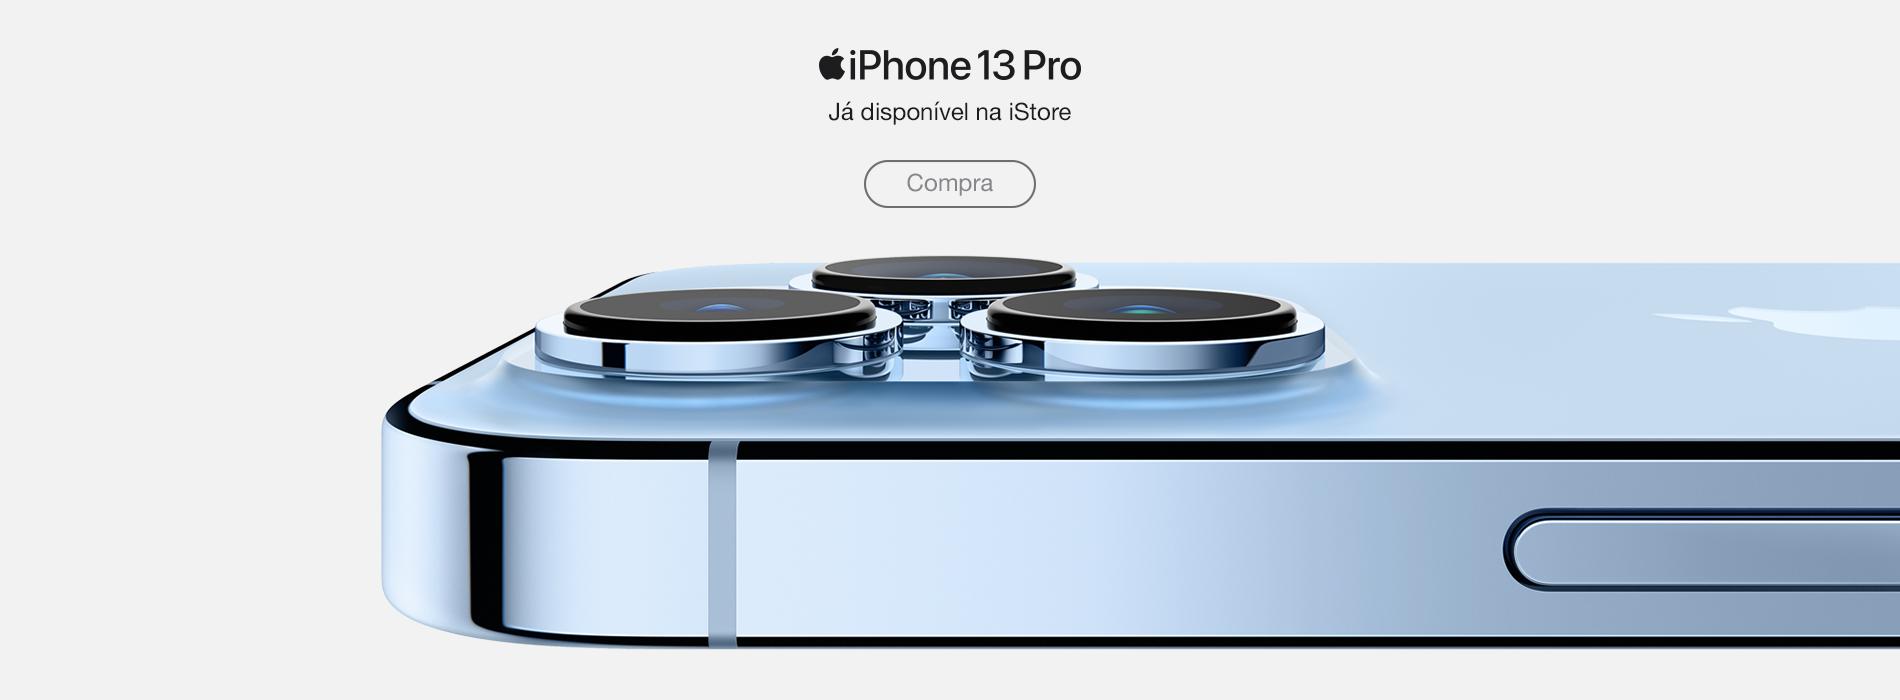 NPI - Disponível - iPhone 13 Pro